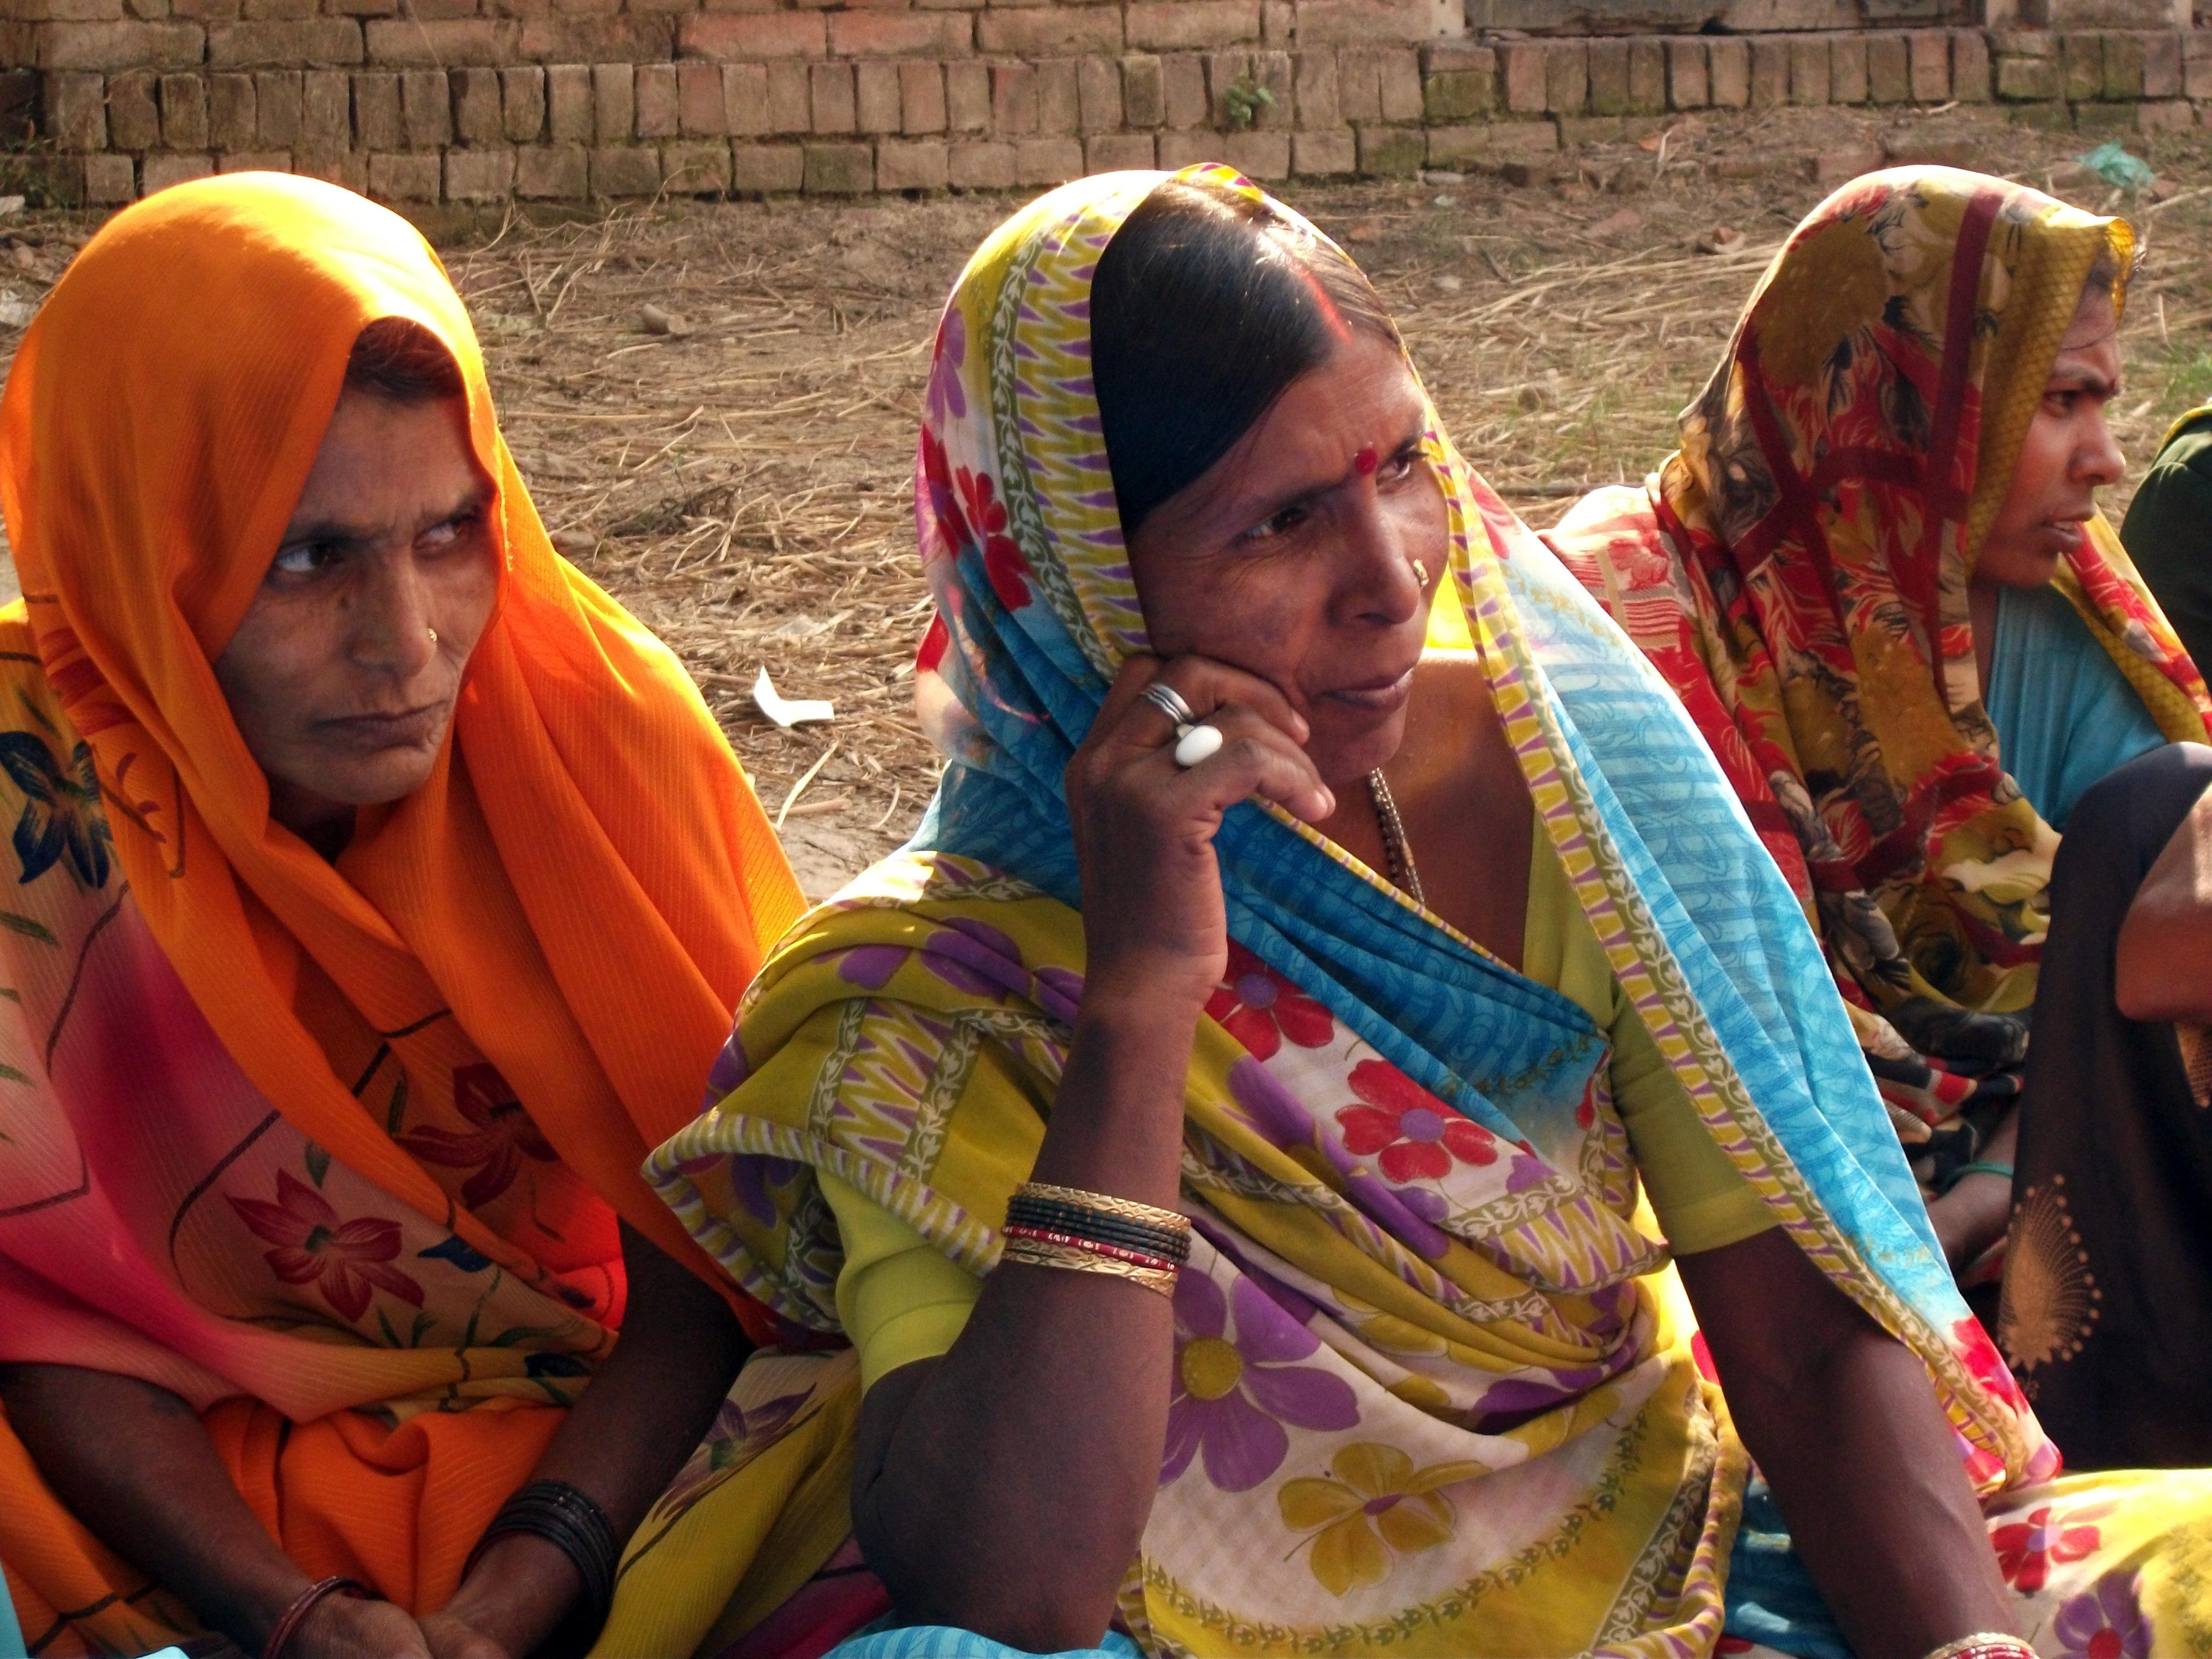 hindu single women in como Kushwaha (koiri) hindu bride - post online matrimonial profiles of kushwaha hindu single women on koiri hindu girls marriages site, kushwaha (koiri) hindu married & unmarried female, kushwaha hindu wedding brides & girls shaadi life partner.